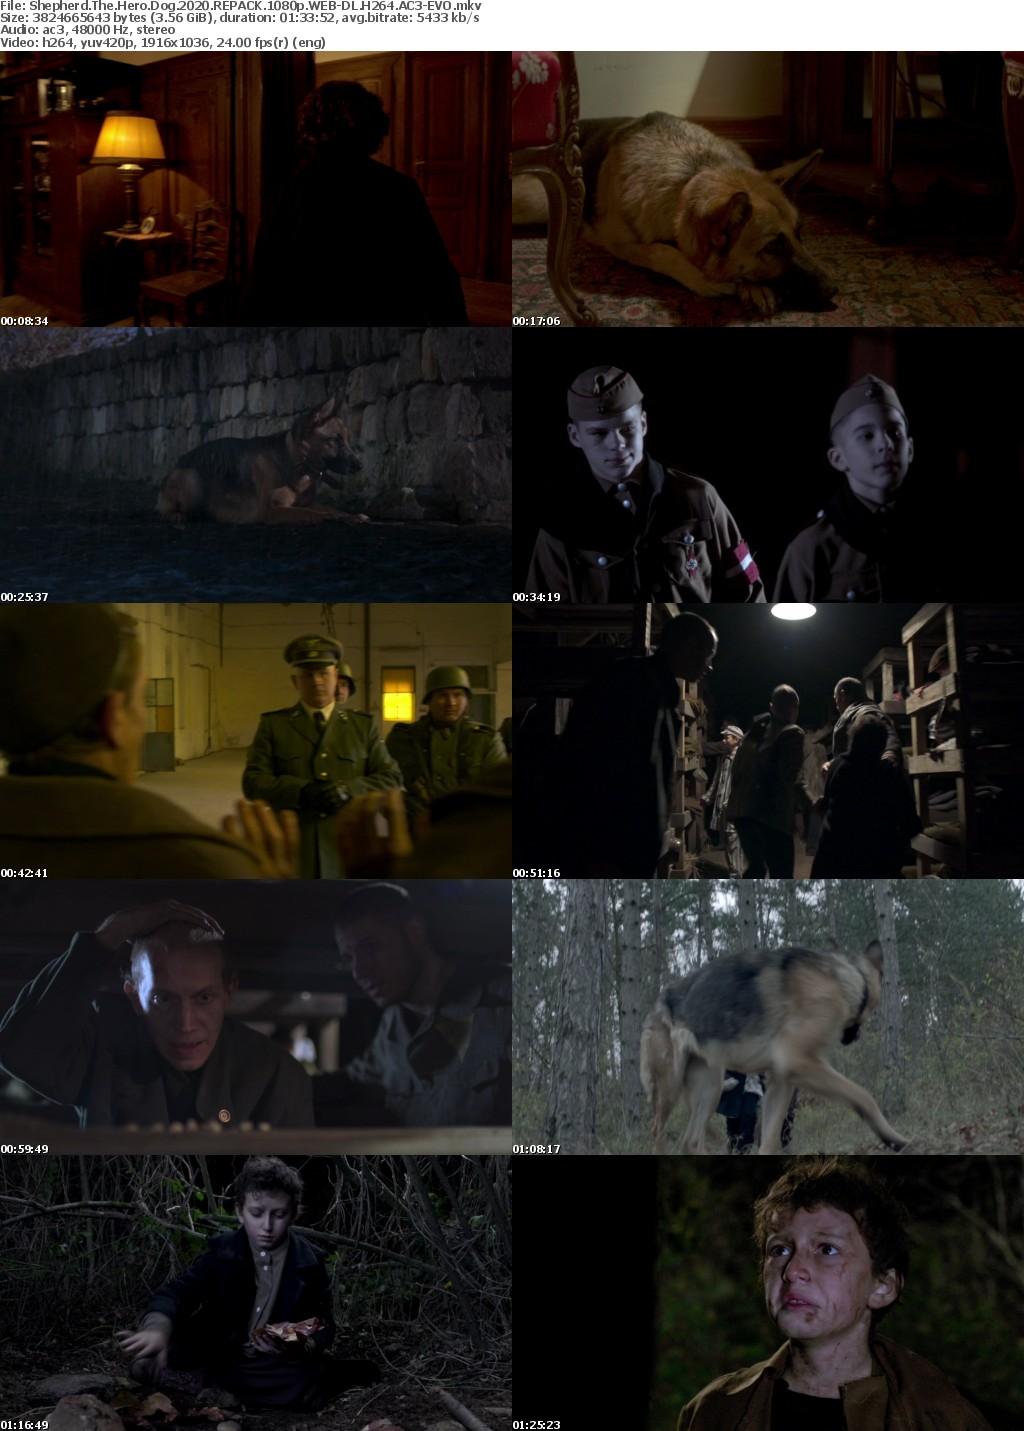 Shepherd The Hero Dog (2020) REPACK 1080p WEB-DL H264 AC3-EVO